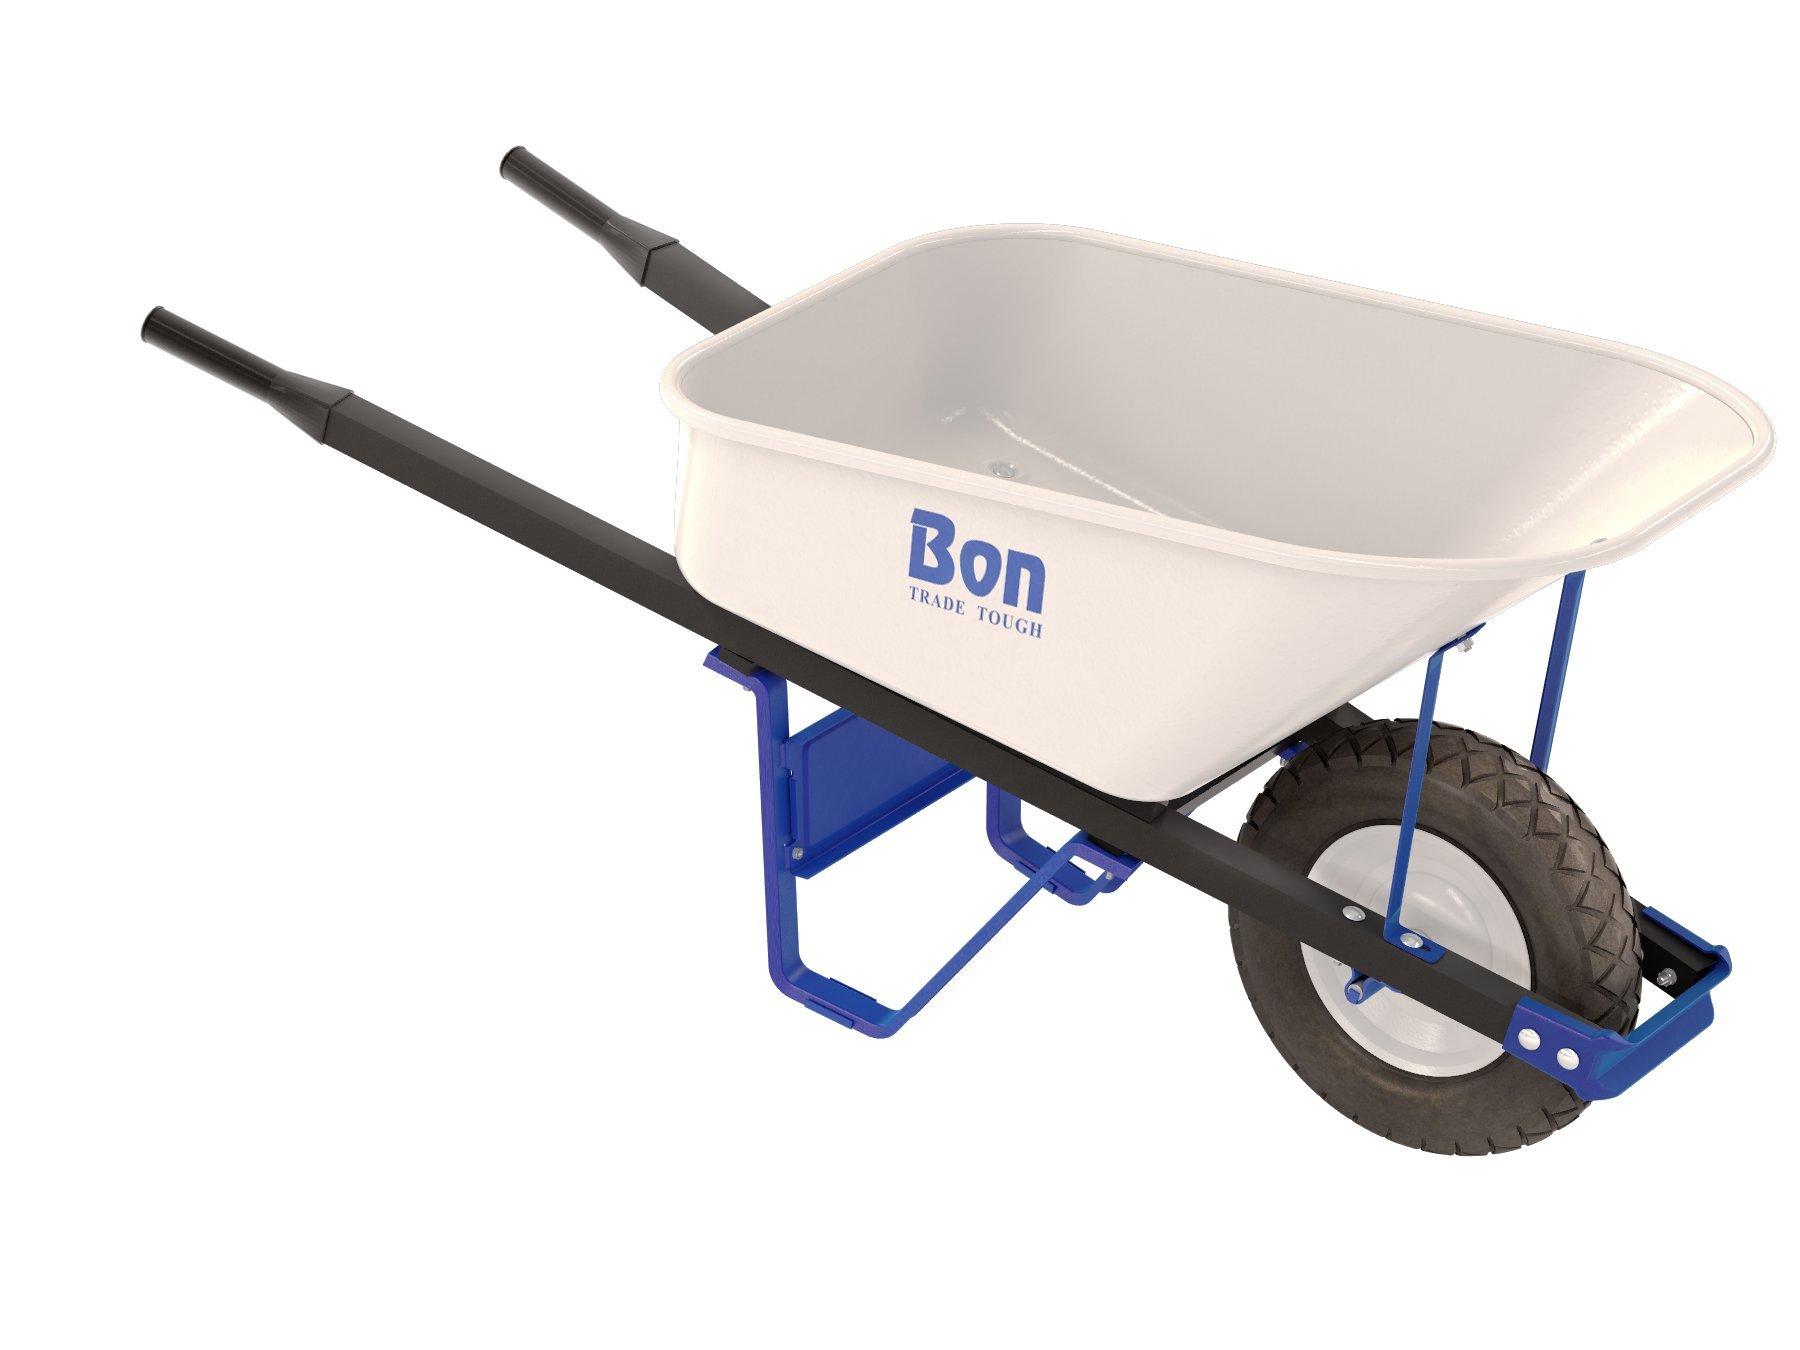 BON 84-974 Trade-Tough Steel Tray Wheelbarrow with 16'' Flat Free Tire, 16 Cu. Ft.